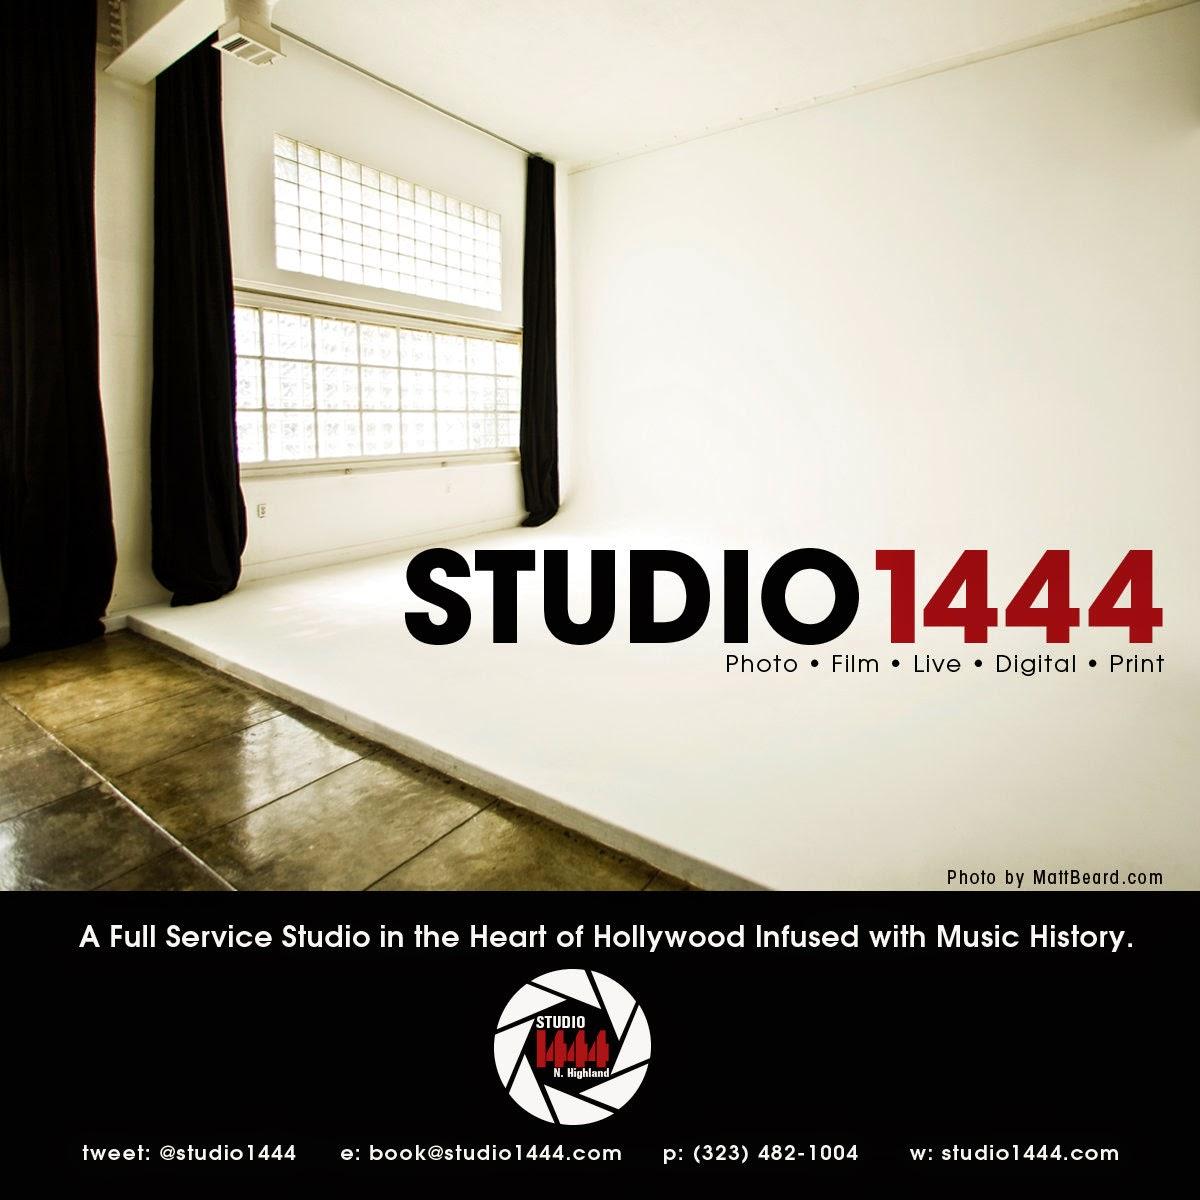 http://studio1444la.blogspot.com/2014/10/what-we-are.html